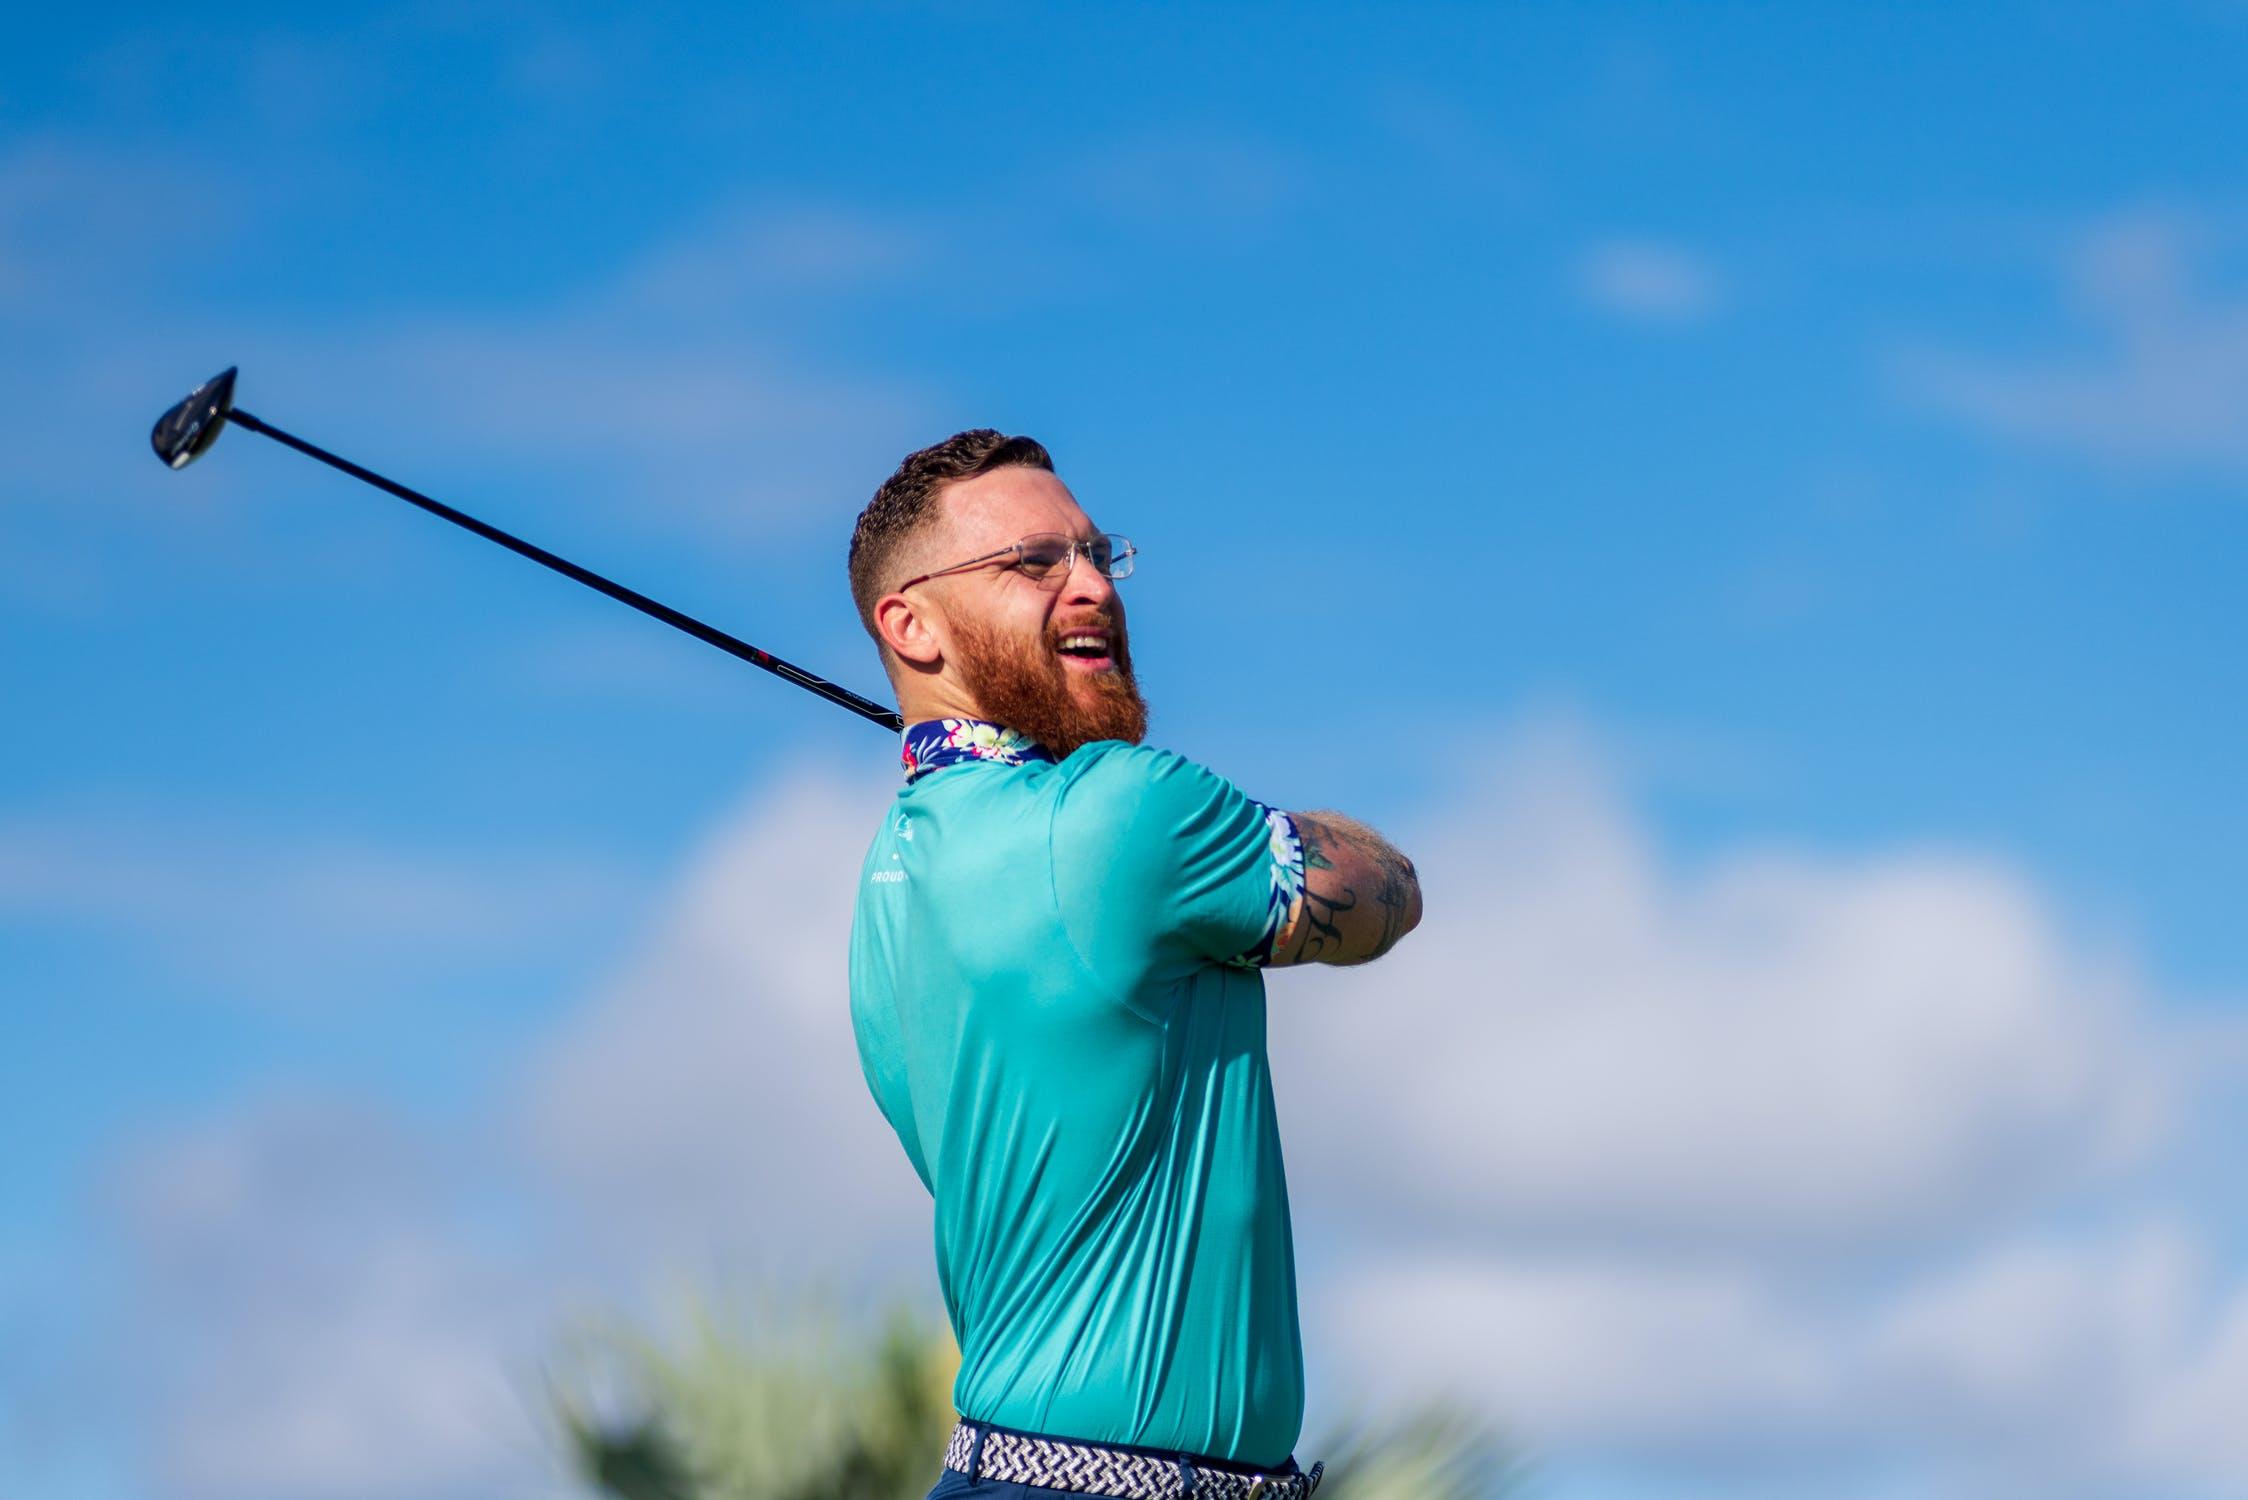 golfing style tips